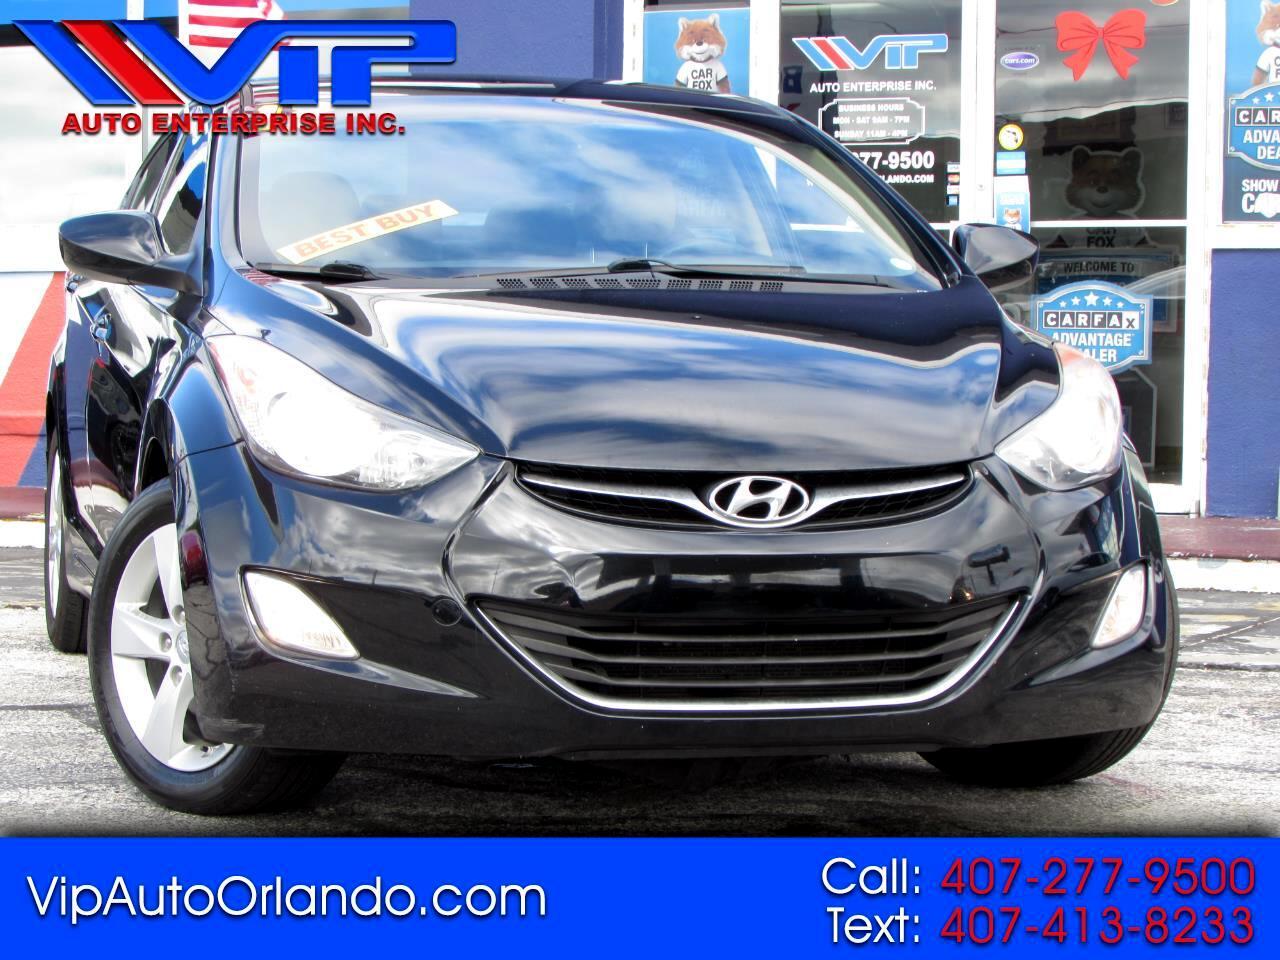 Hyundai Elantra 4dr Sdn Auto GLS (Alabama Plant) 2013